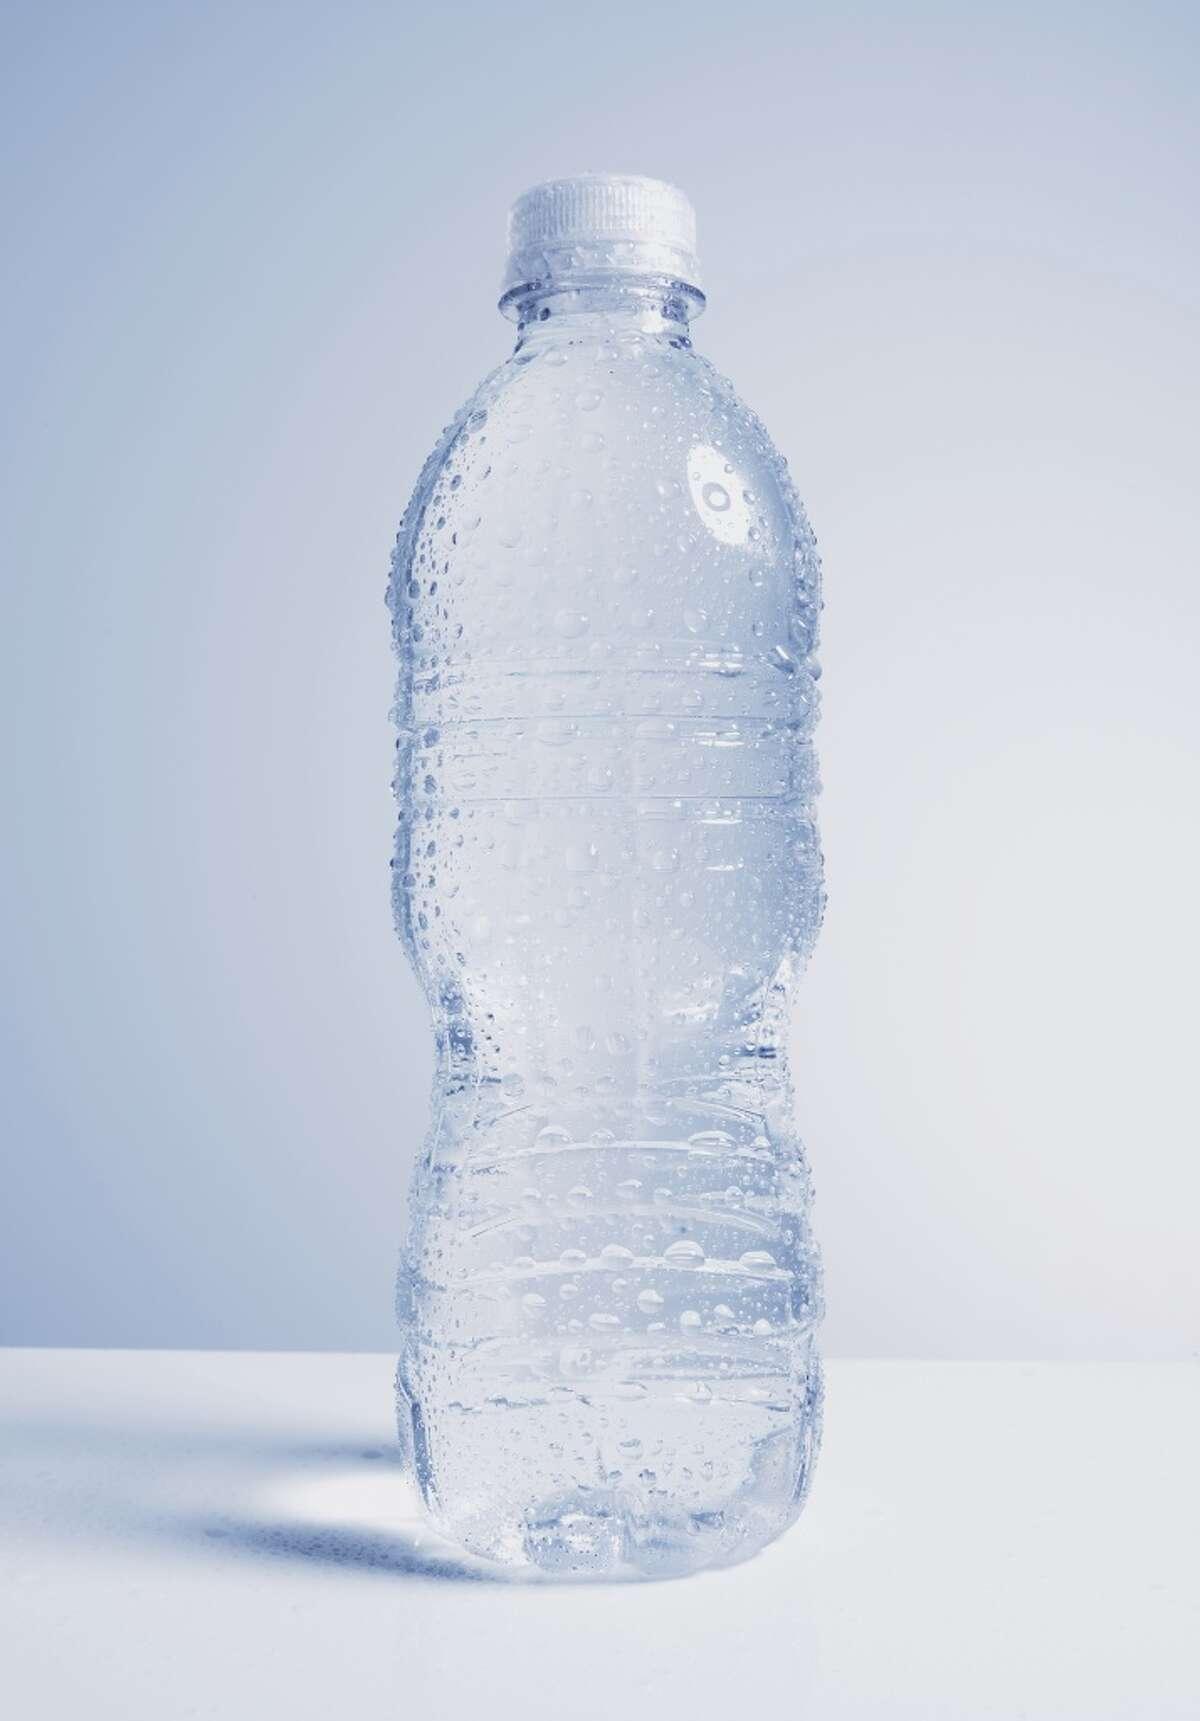 Bottled water Sold: 79,941 20-oz. bottles and 22,288 1-liter bottlesMade: $366,416